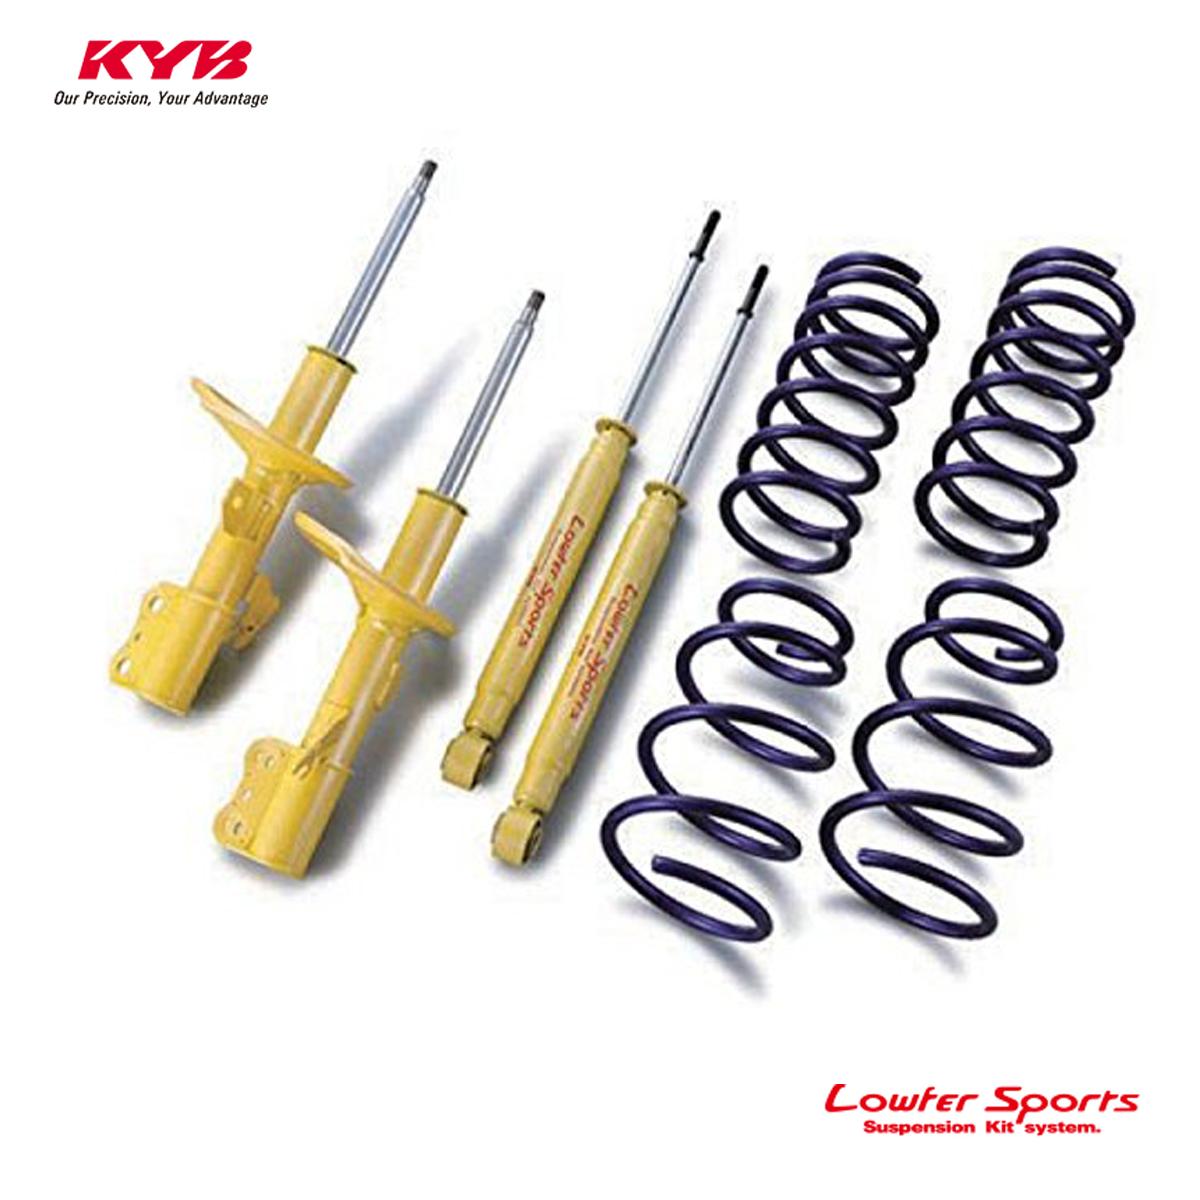 KYB カヤバ パレット MK21S ショックアブソーバー サスペンションキット Lowfer Sports LKIT-MK21S 配送先条件有り